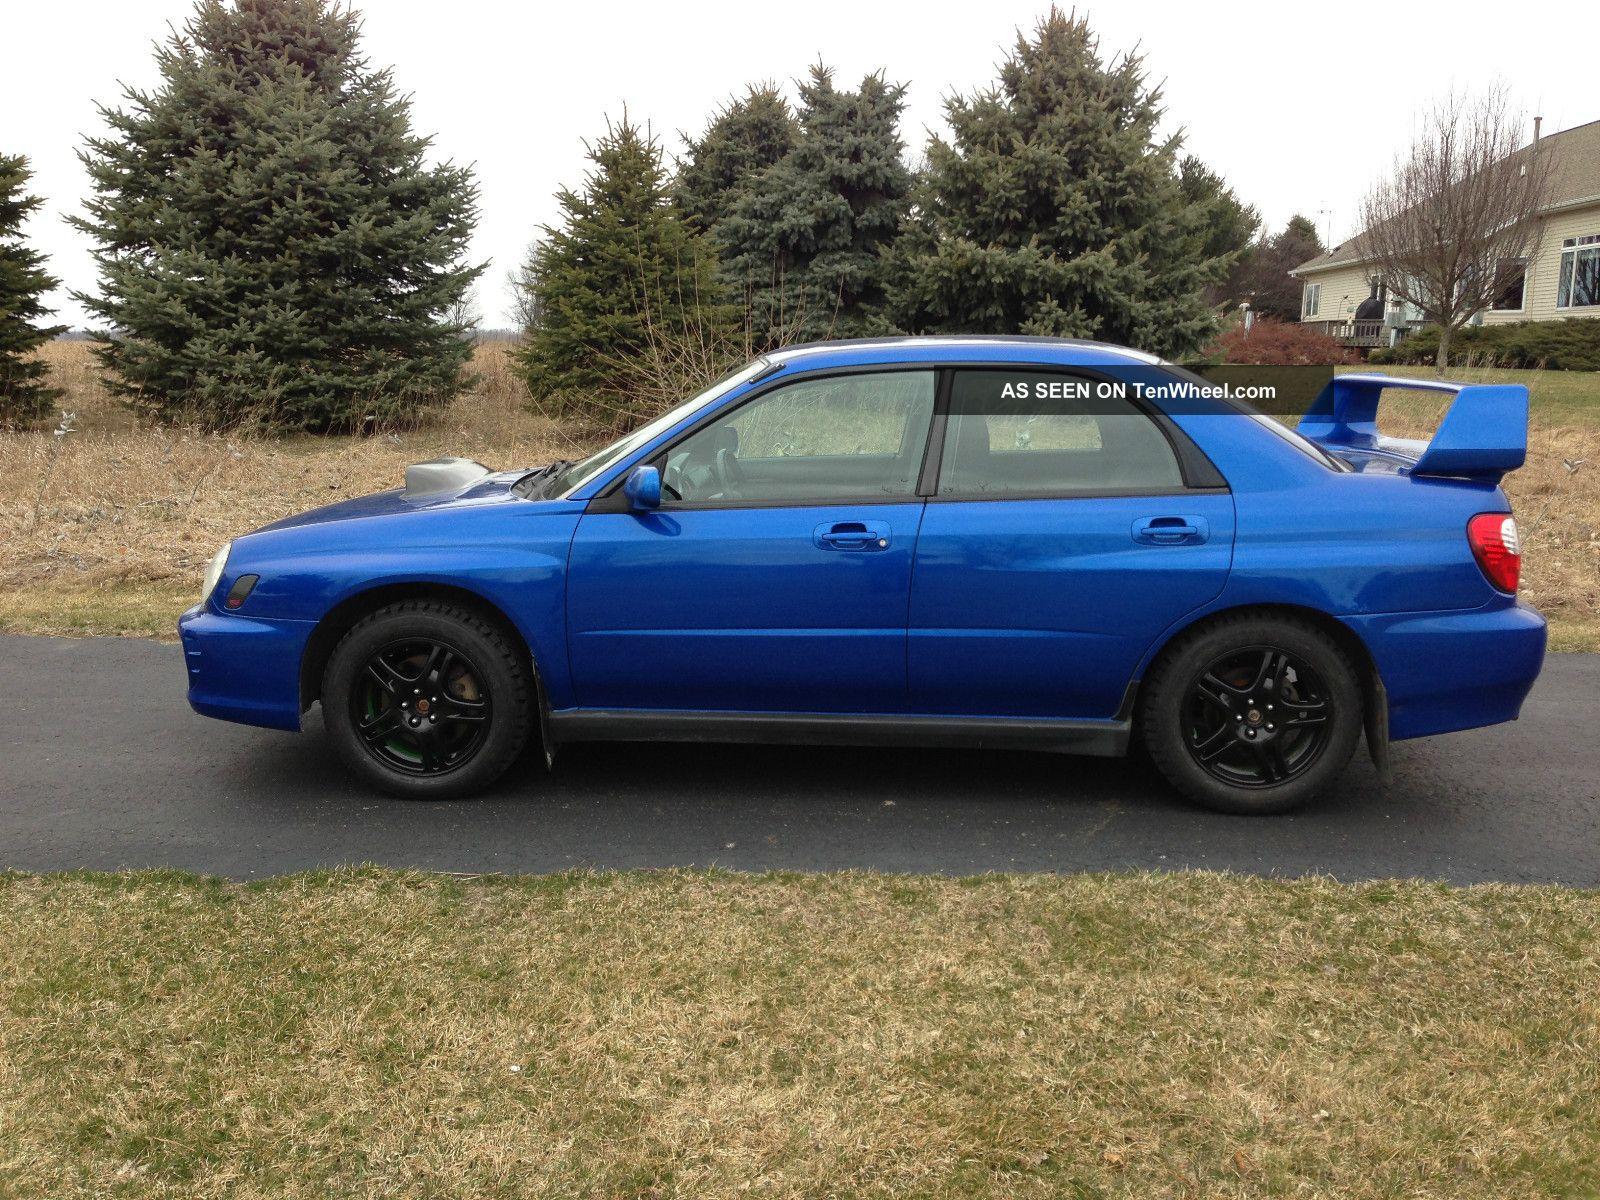 2002 Subaru Wrx Impreza 2 0t Impreza Sti Mods 2 0 Turbo